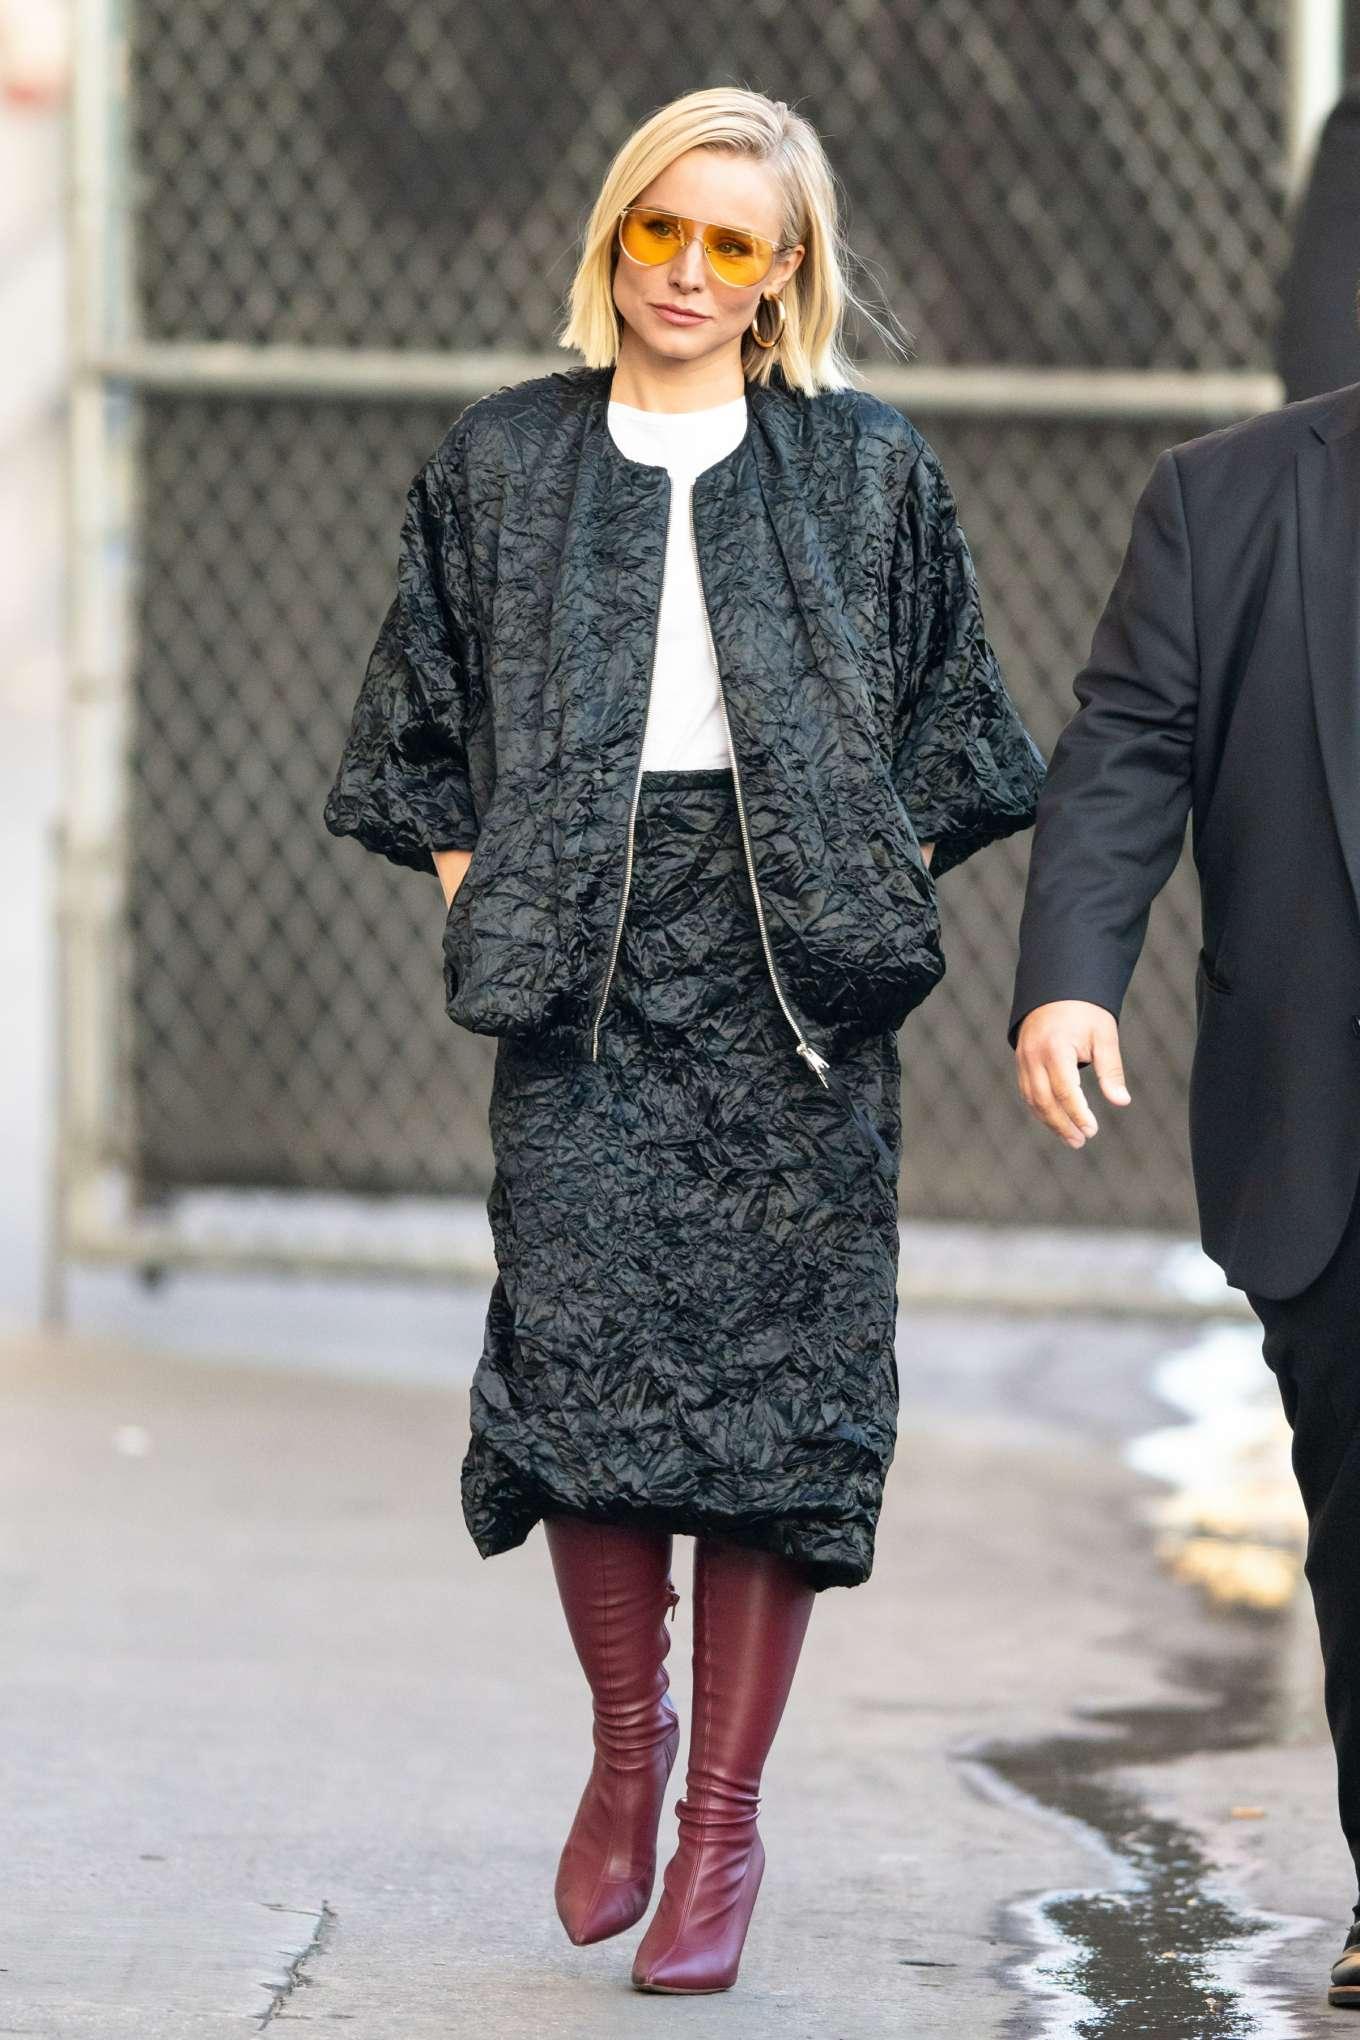 Kristen Bell - Arriving for Jimmy Kimmel in Los Angeles